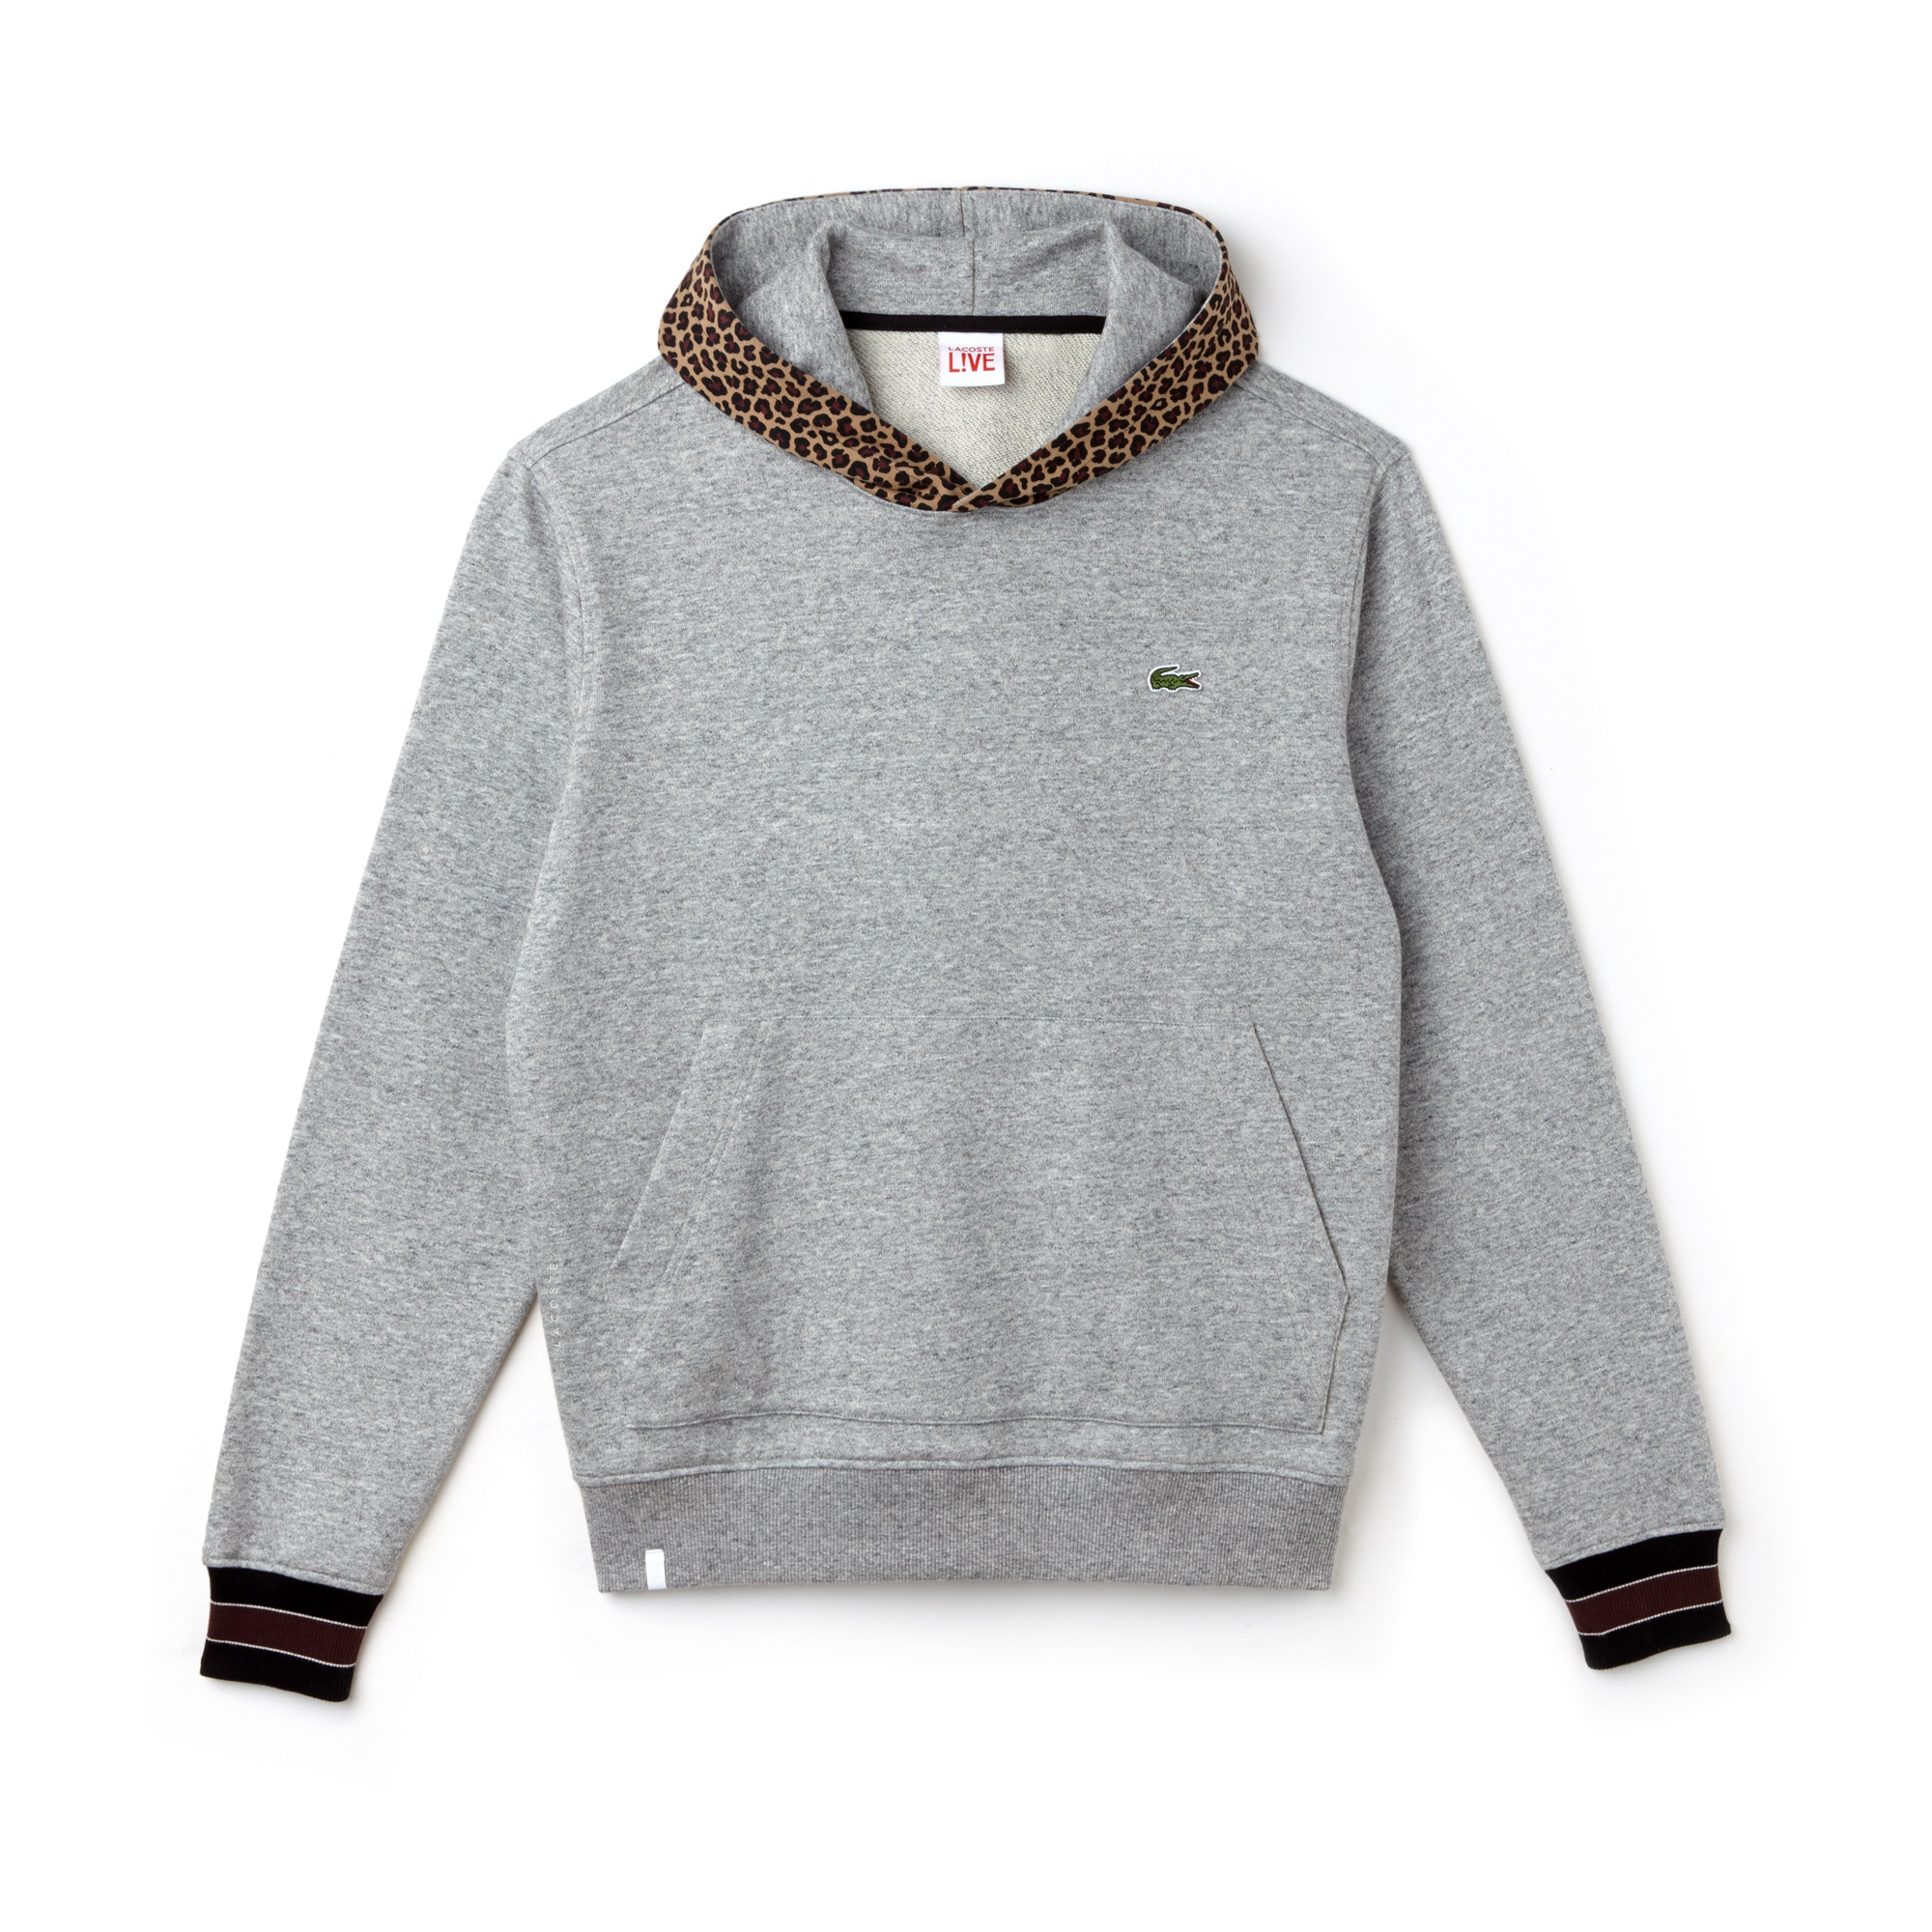 Herren-Sweatshirt mit Leopard-Print mit Kapuze LACOSTE L!VE